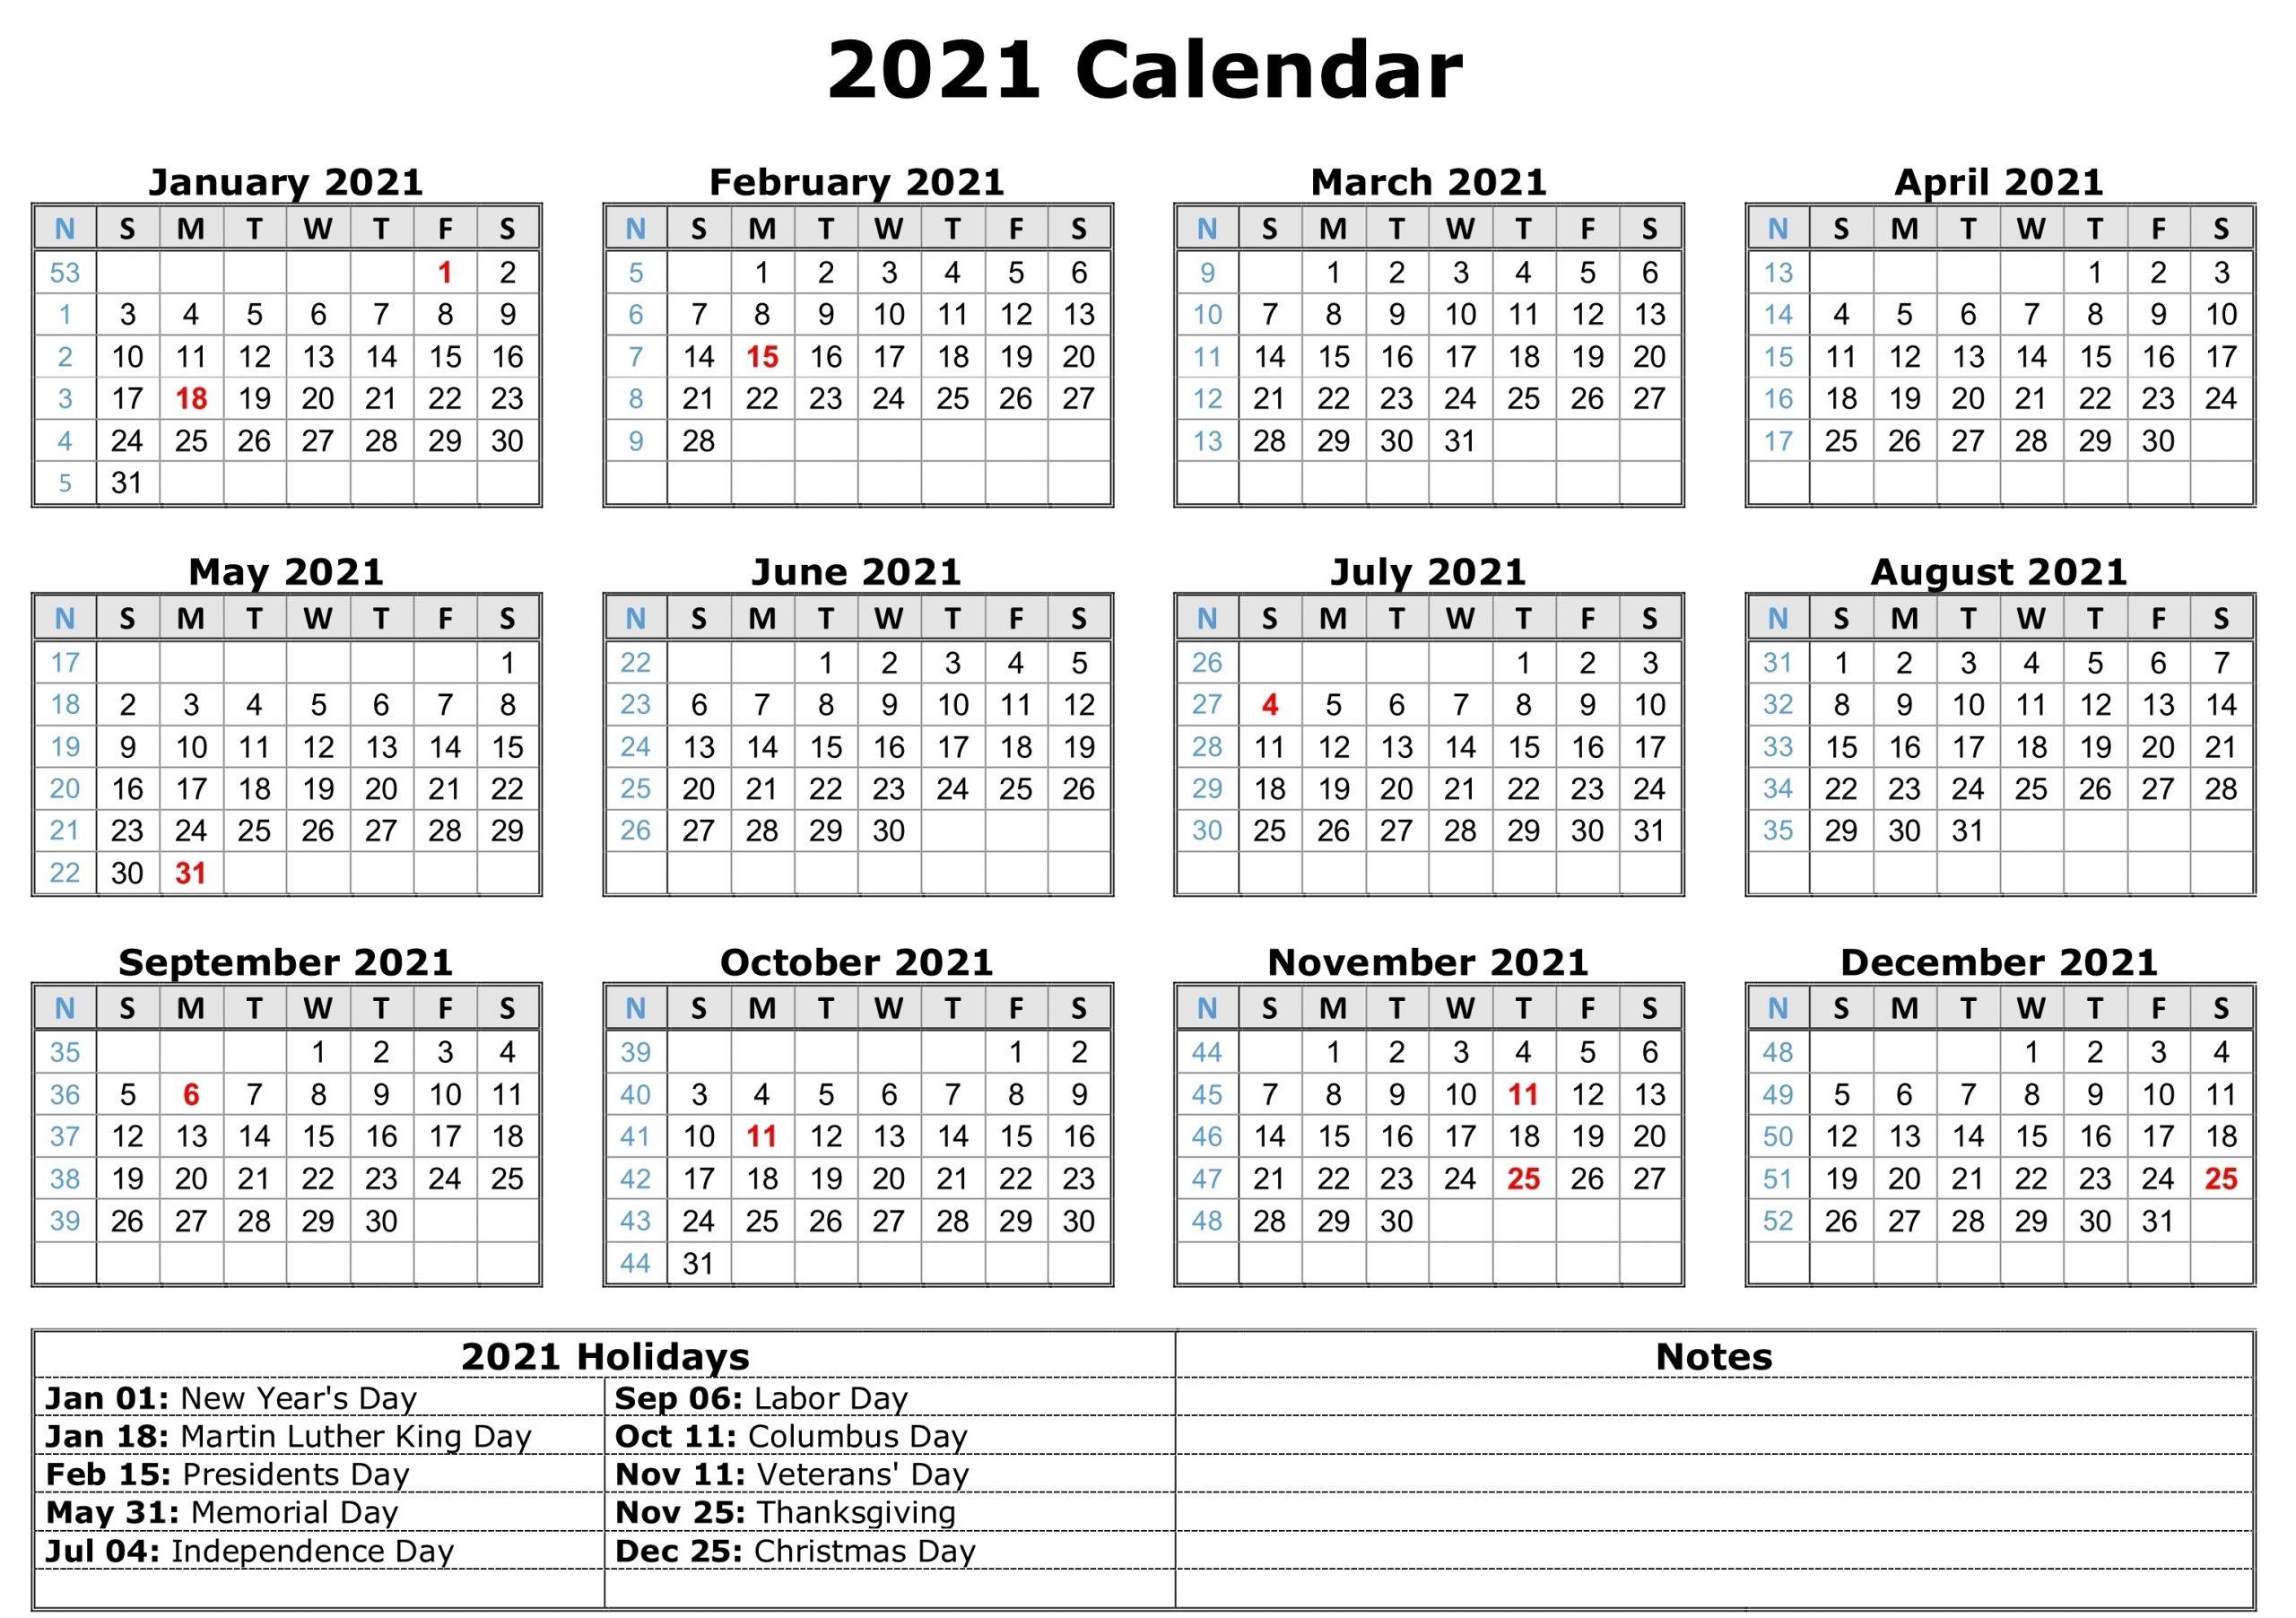 Take 2021 Calendar Philippine Holidays